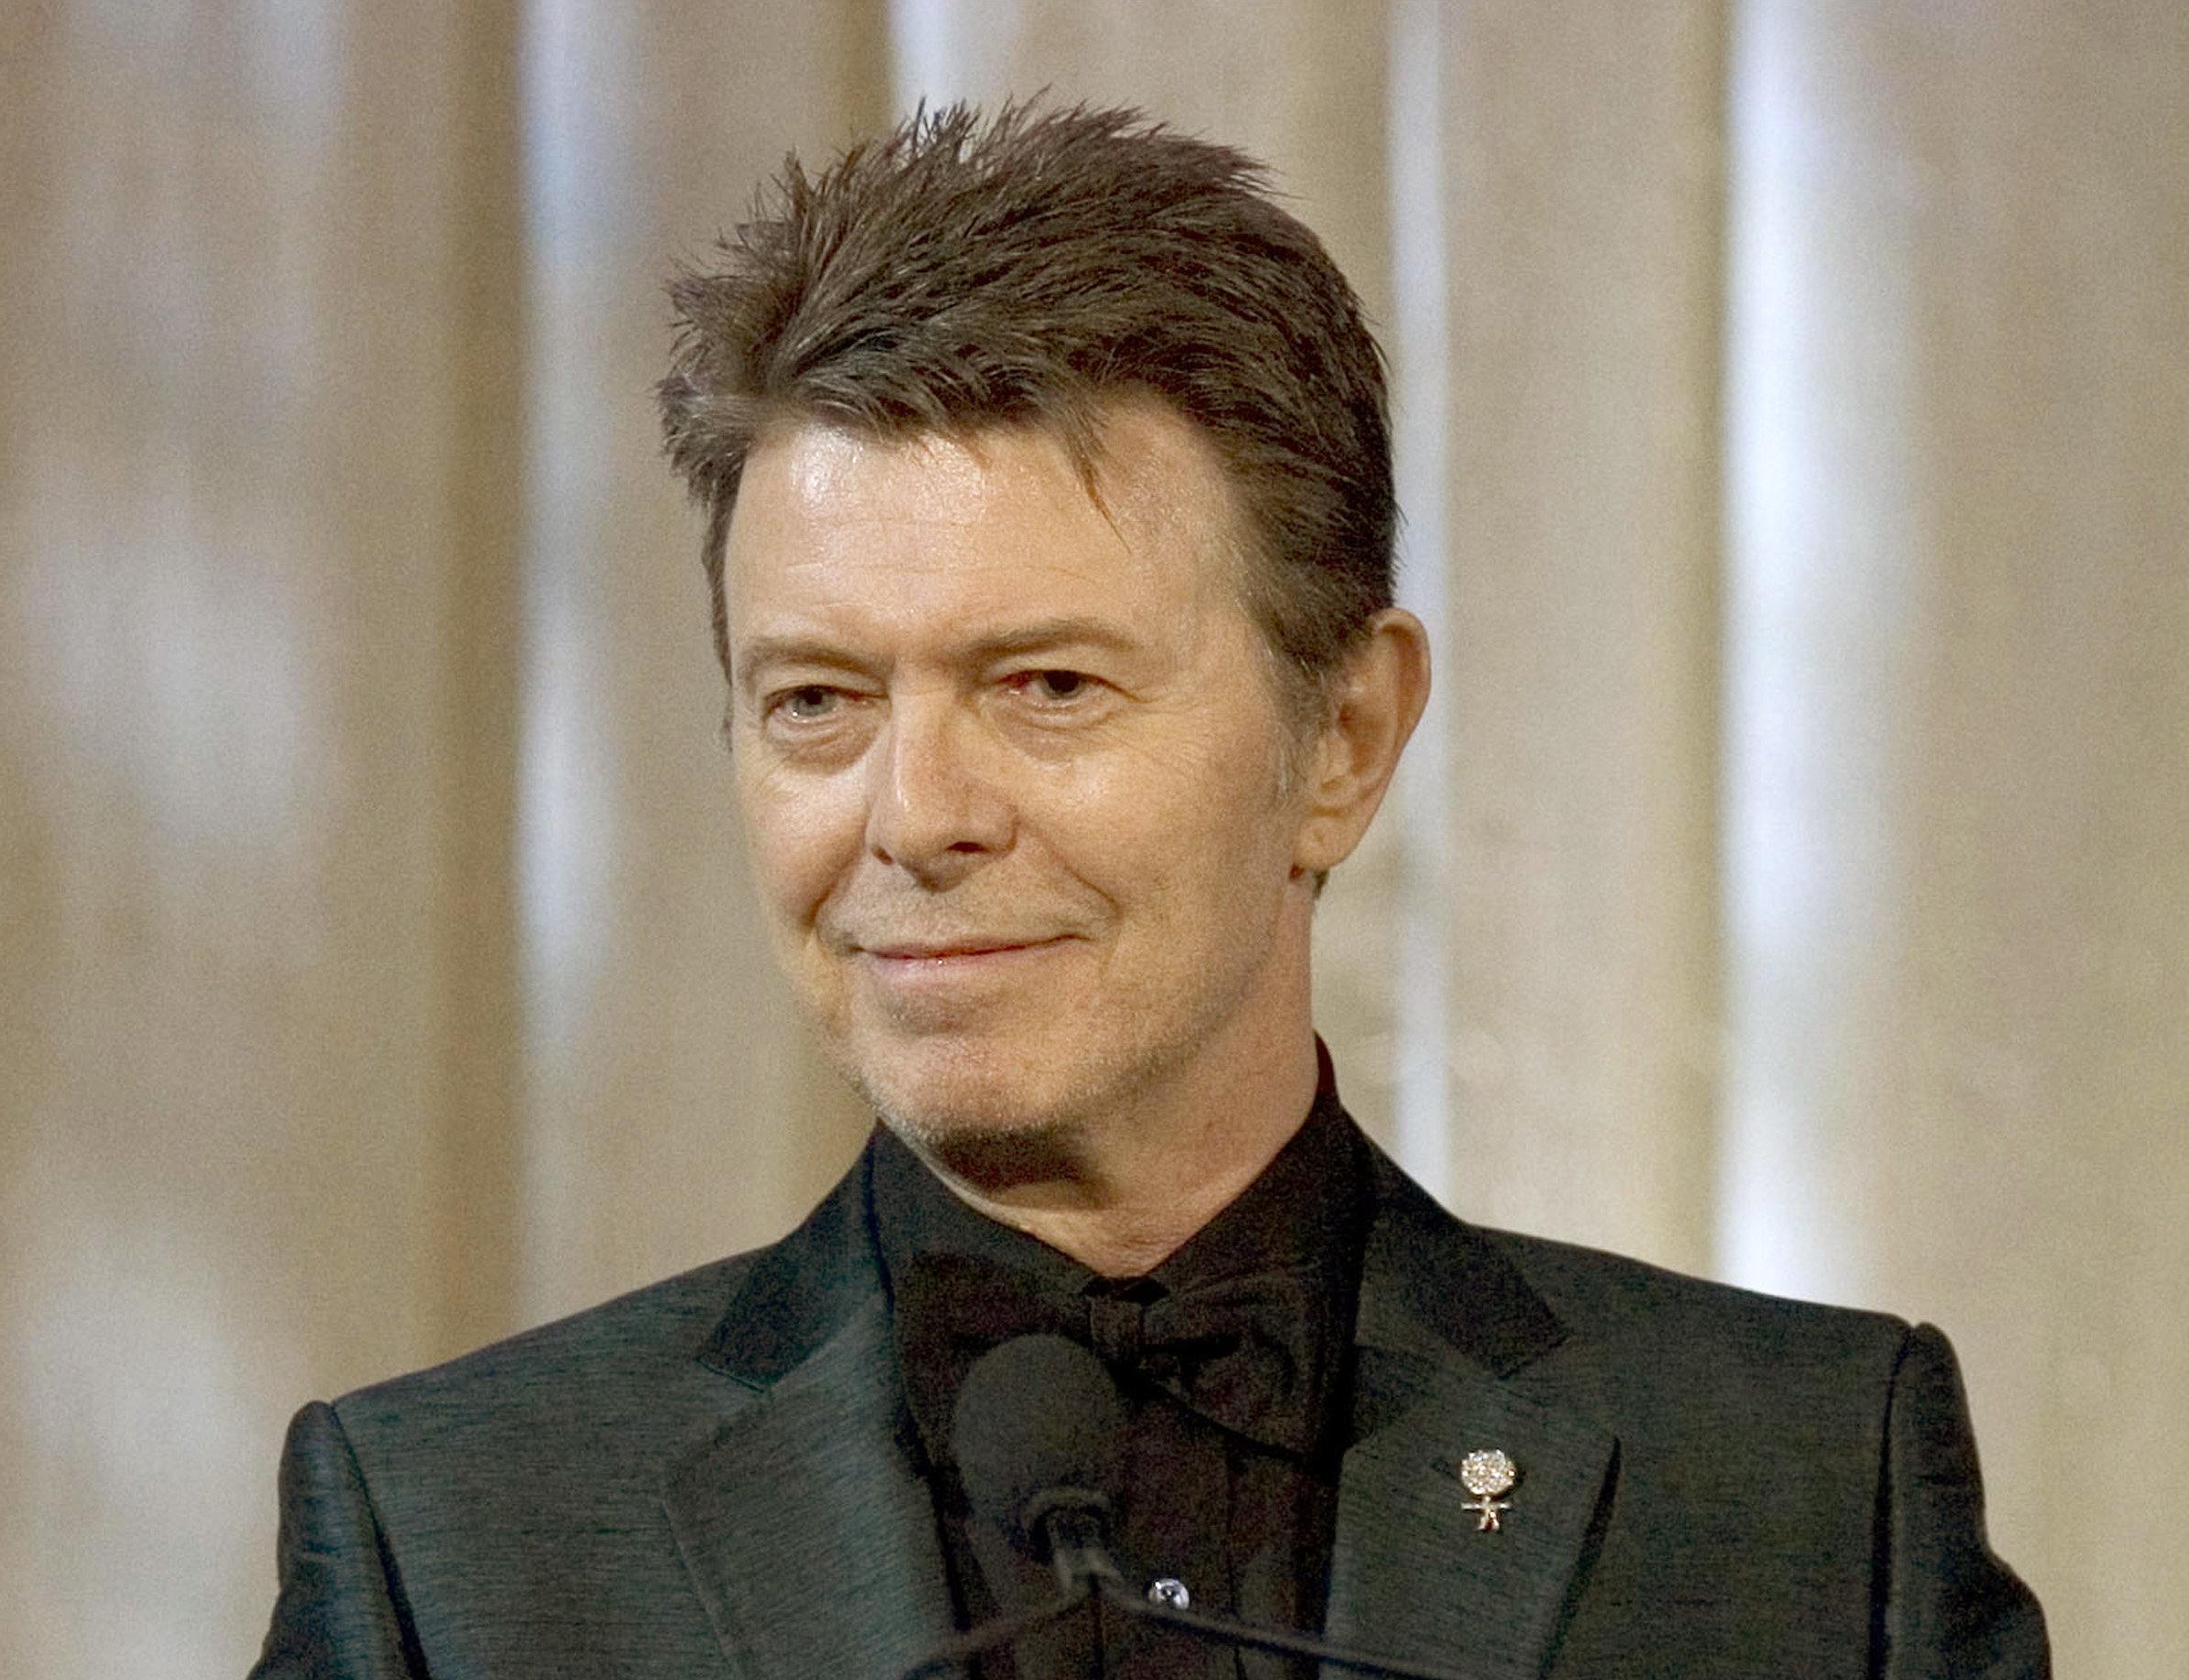 David Bowie Didn't Know Cancer Was Terminal Until Three Months Before